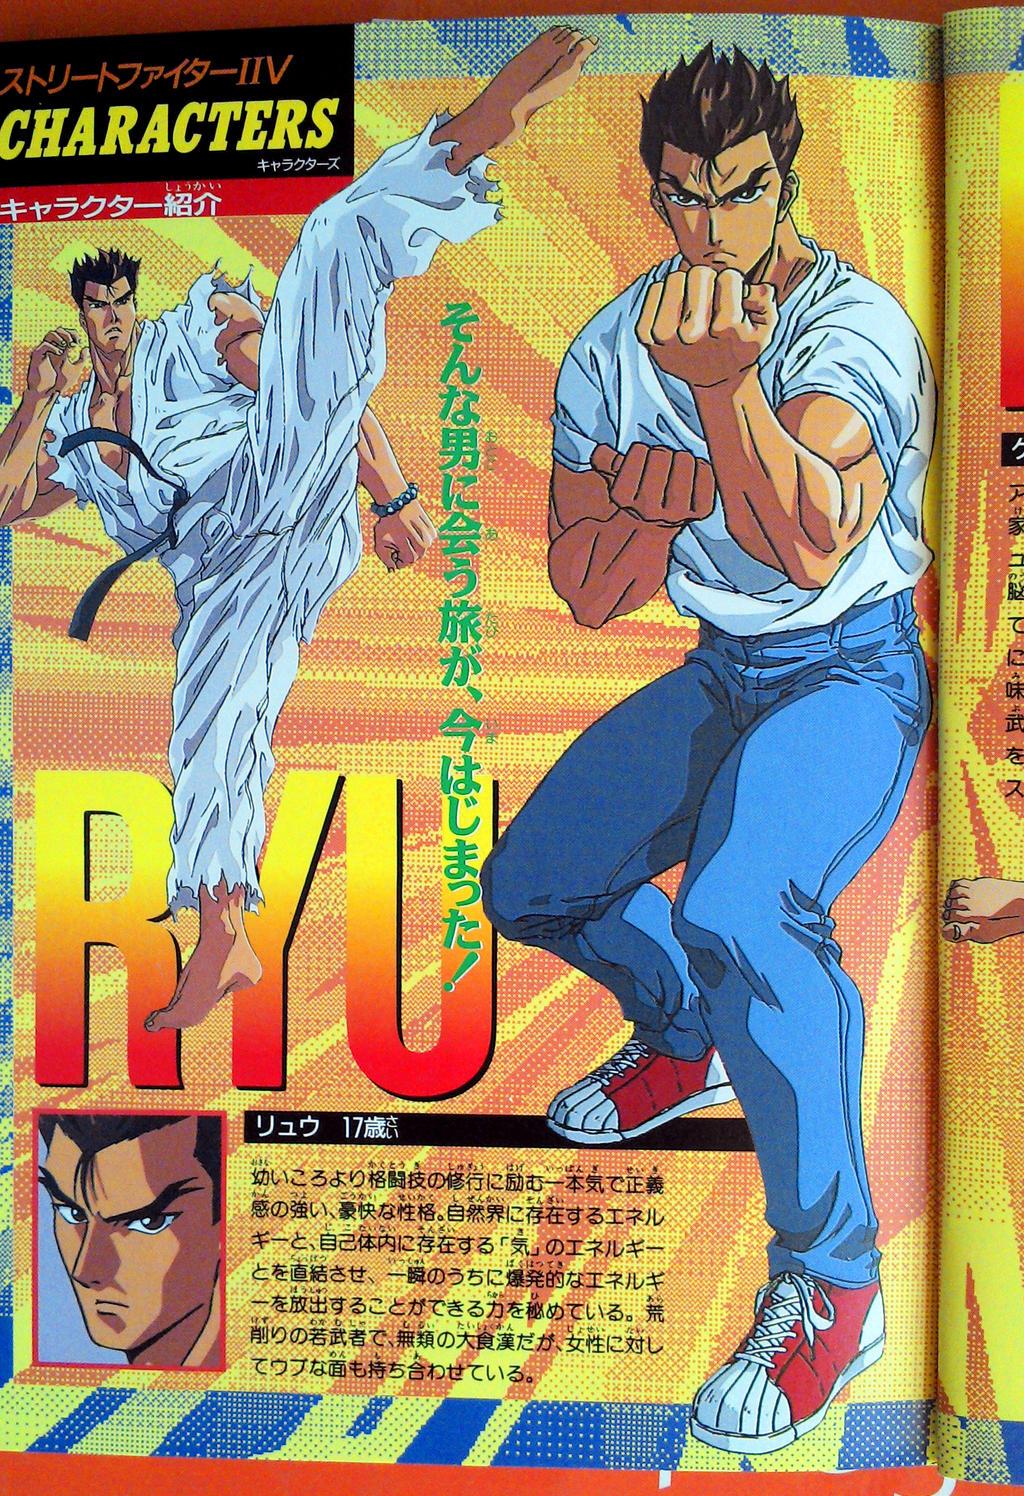 [Análise Retro Anime] - Street Fighter 2 Victory [18+] Street_fighter_ii_v__set_film_comics_232_by_digitalwideresource-d6zmbcb